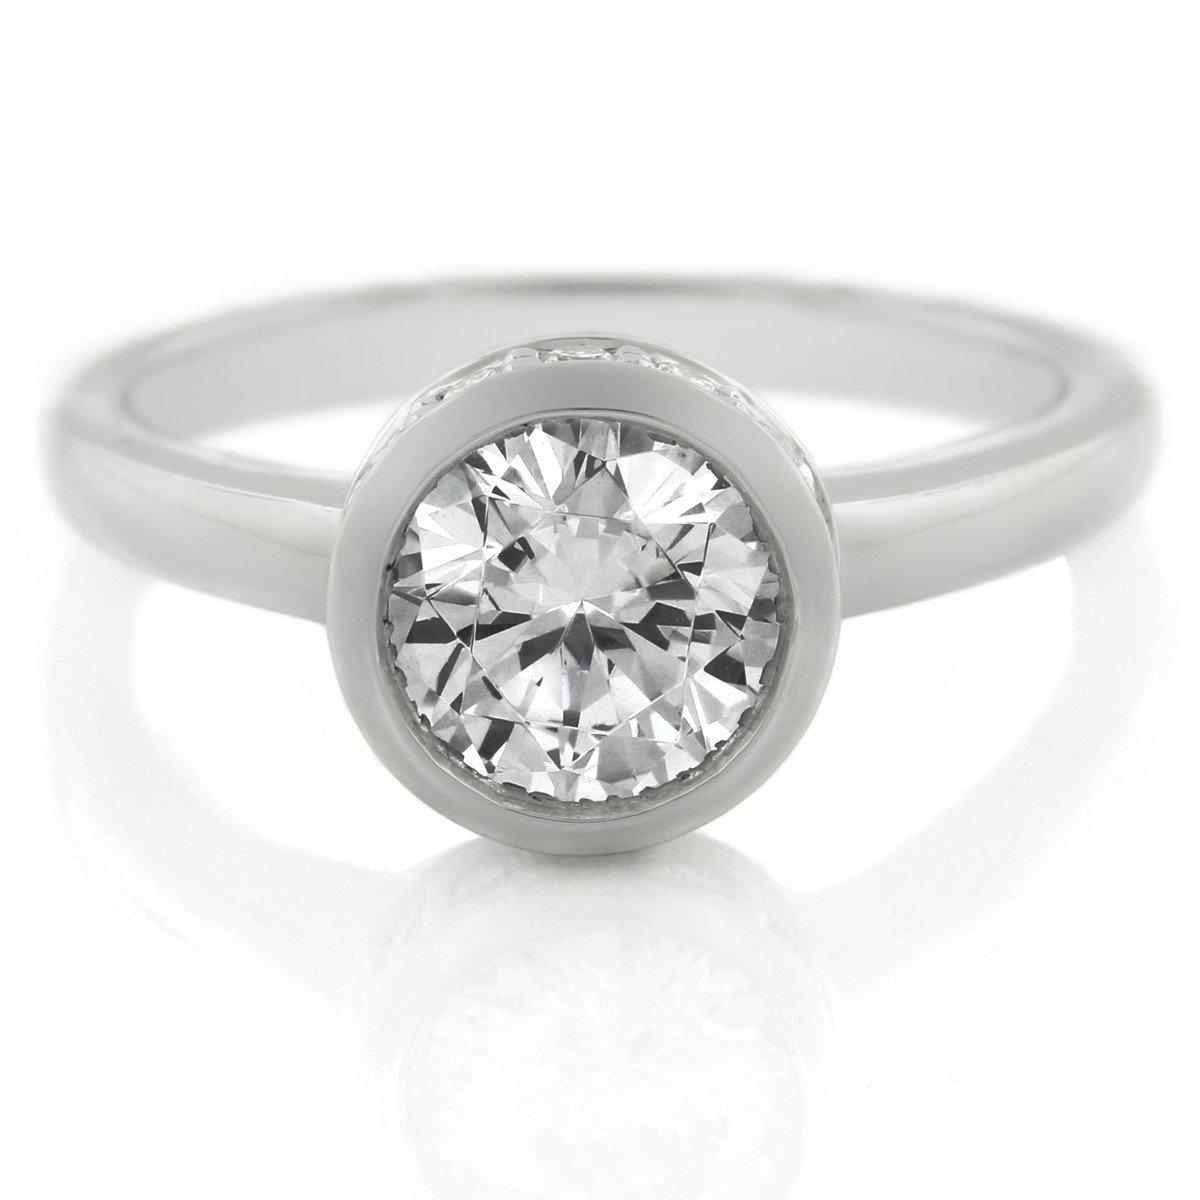 Top 5 Best Engagement Ring Settings: Bezel Setting